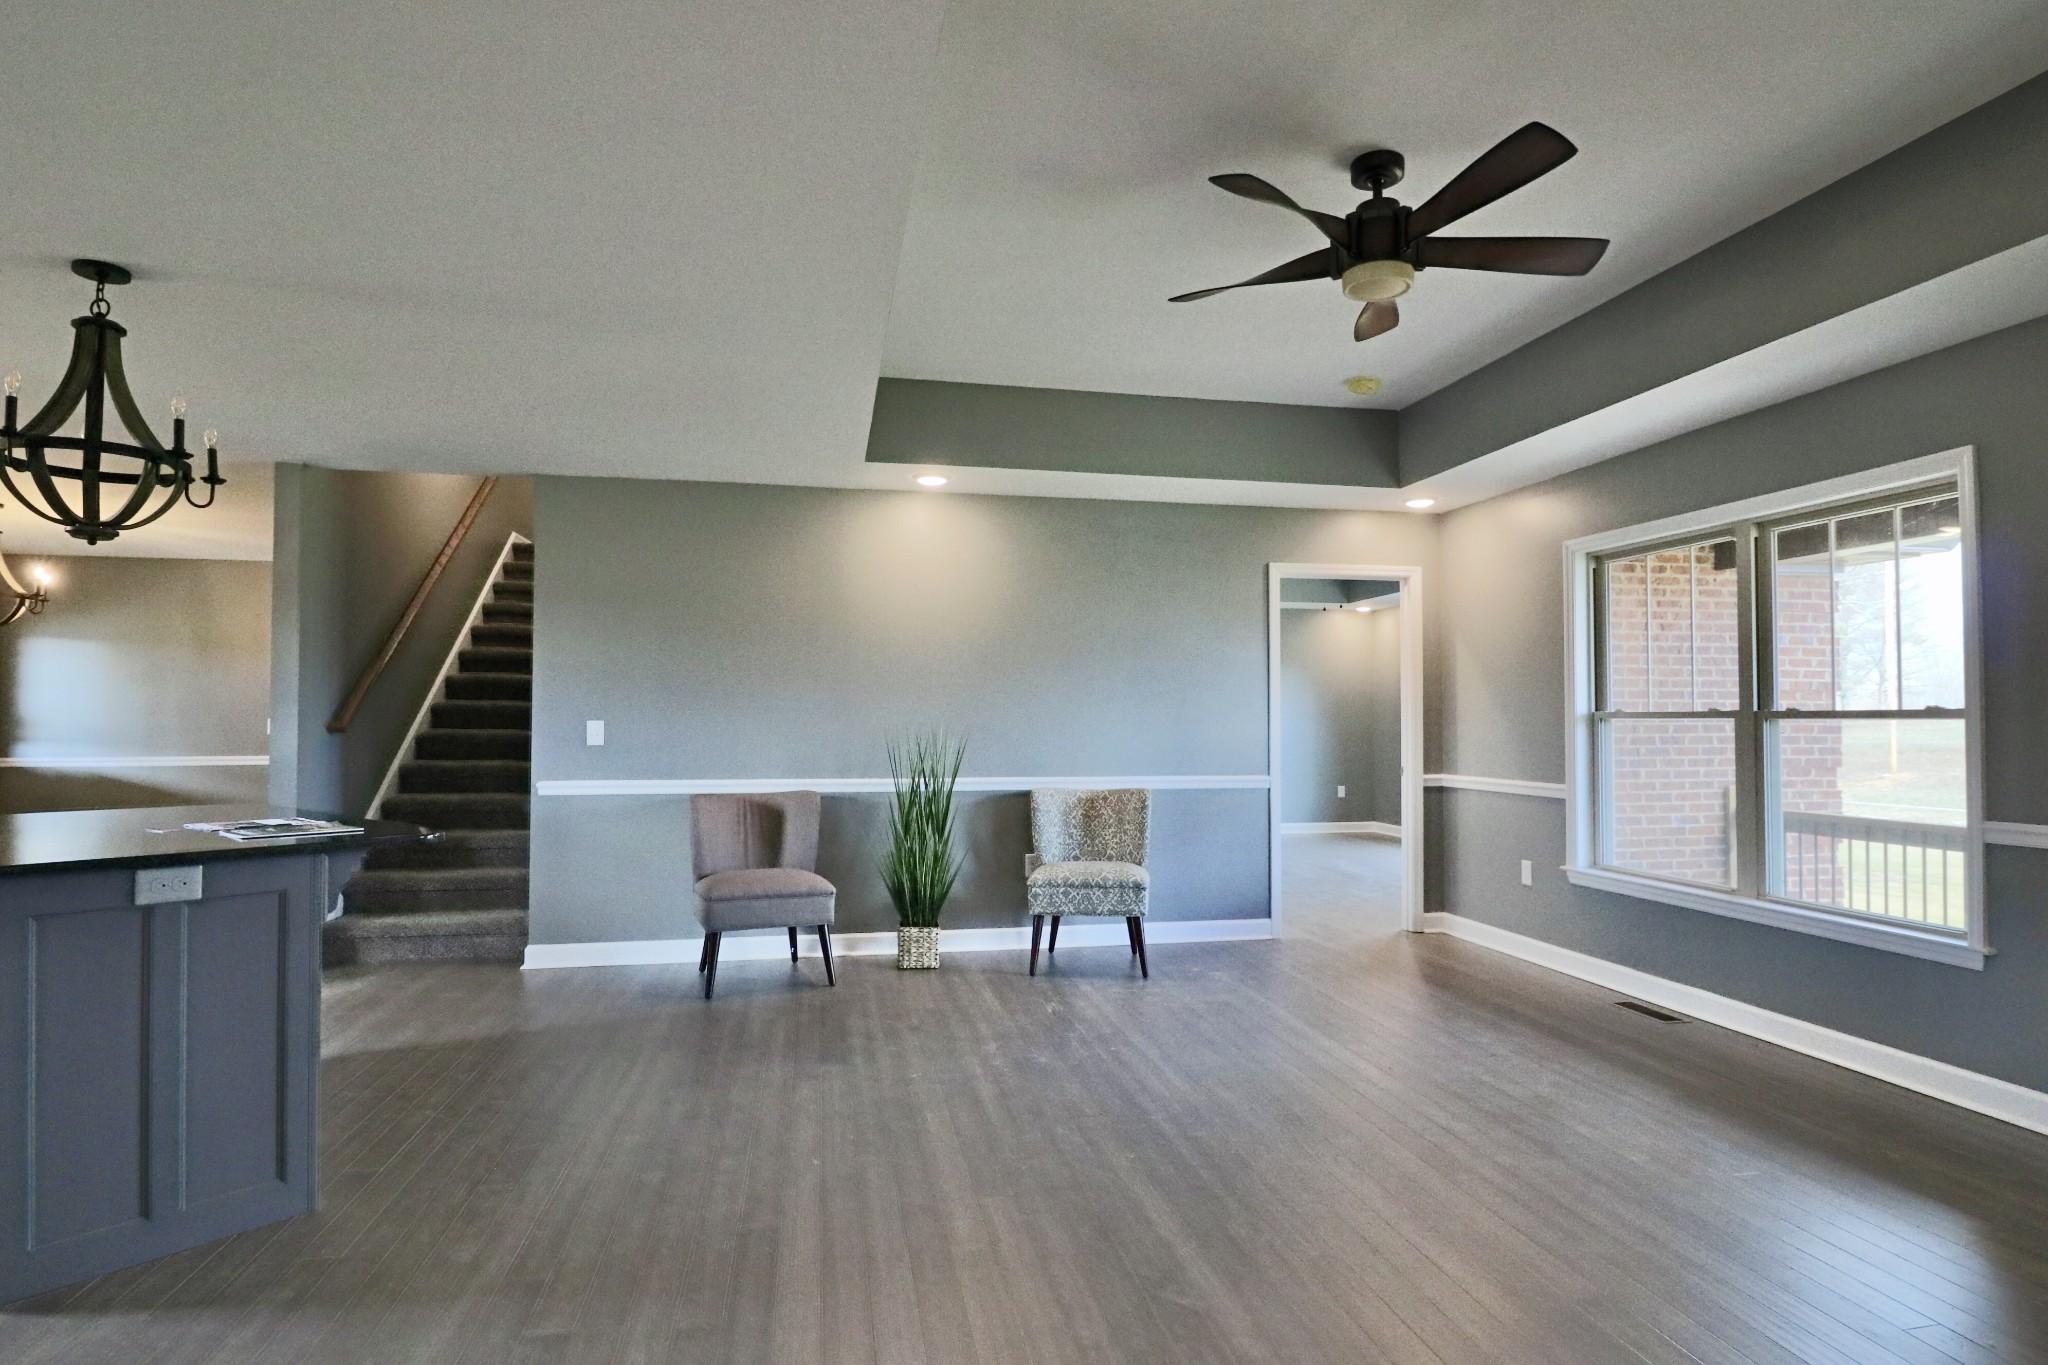 23 Bunting Ln., Summertown, TN 38483 - Summertown, TN real estate listing